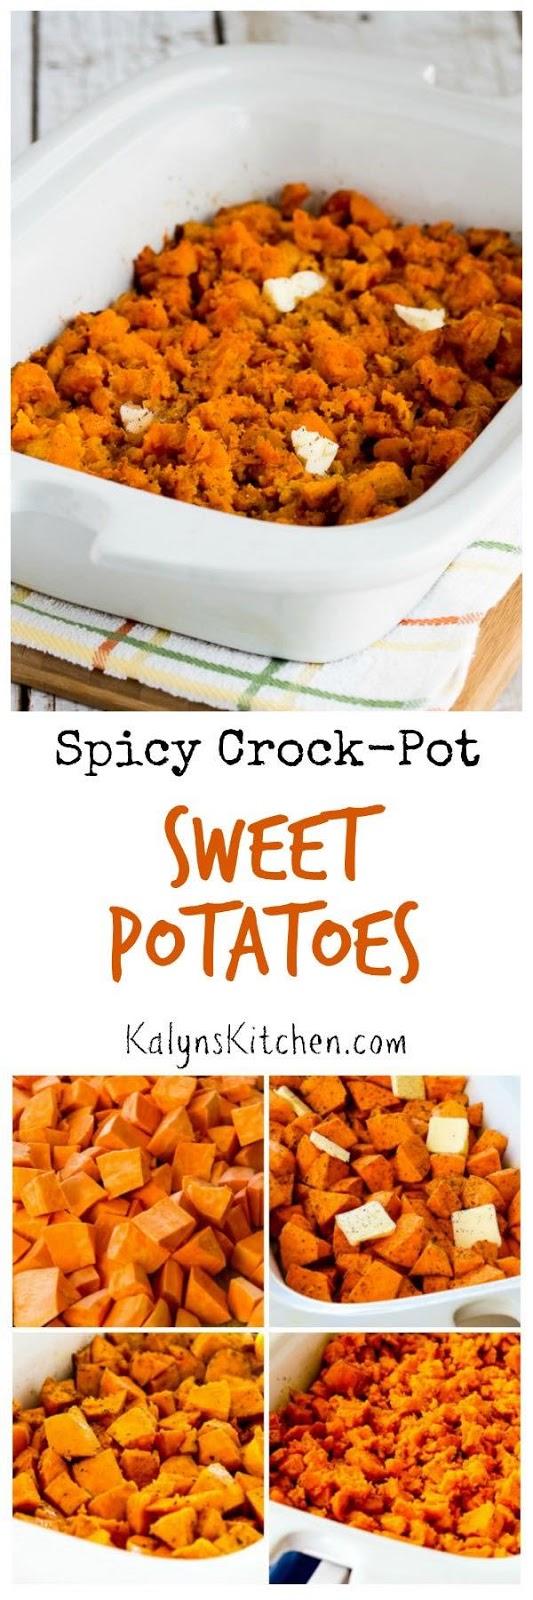 Spicy Crockpot Sweet Potatoes found on KalynsKitchen.com